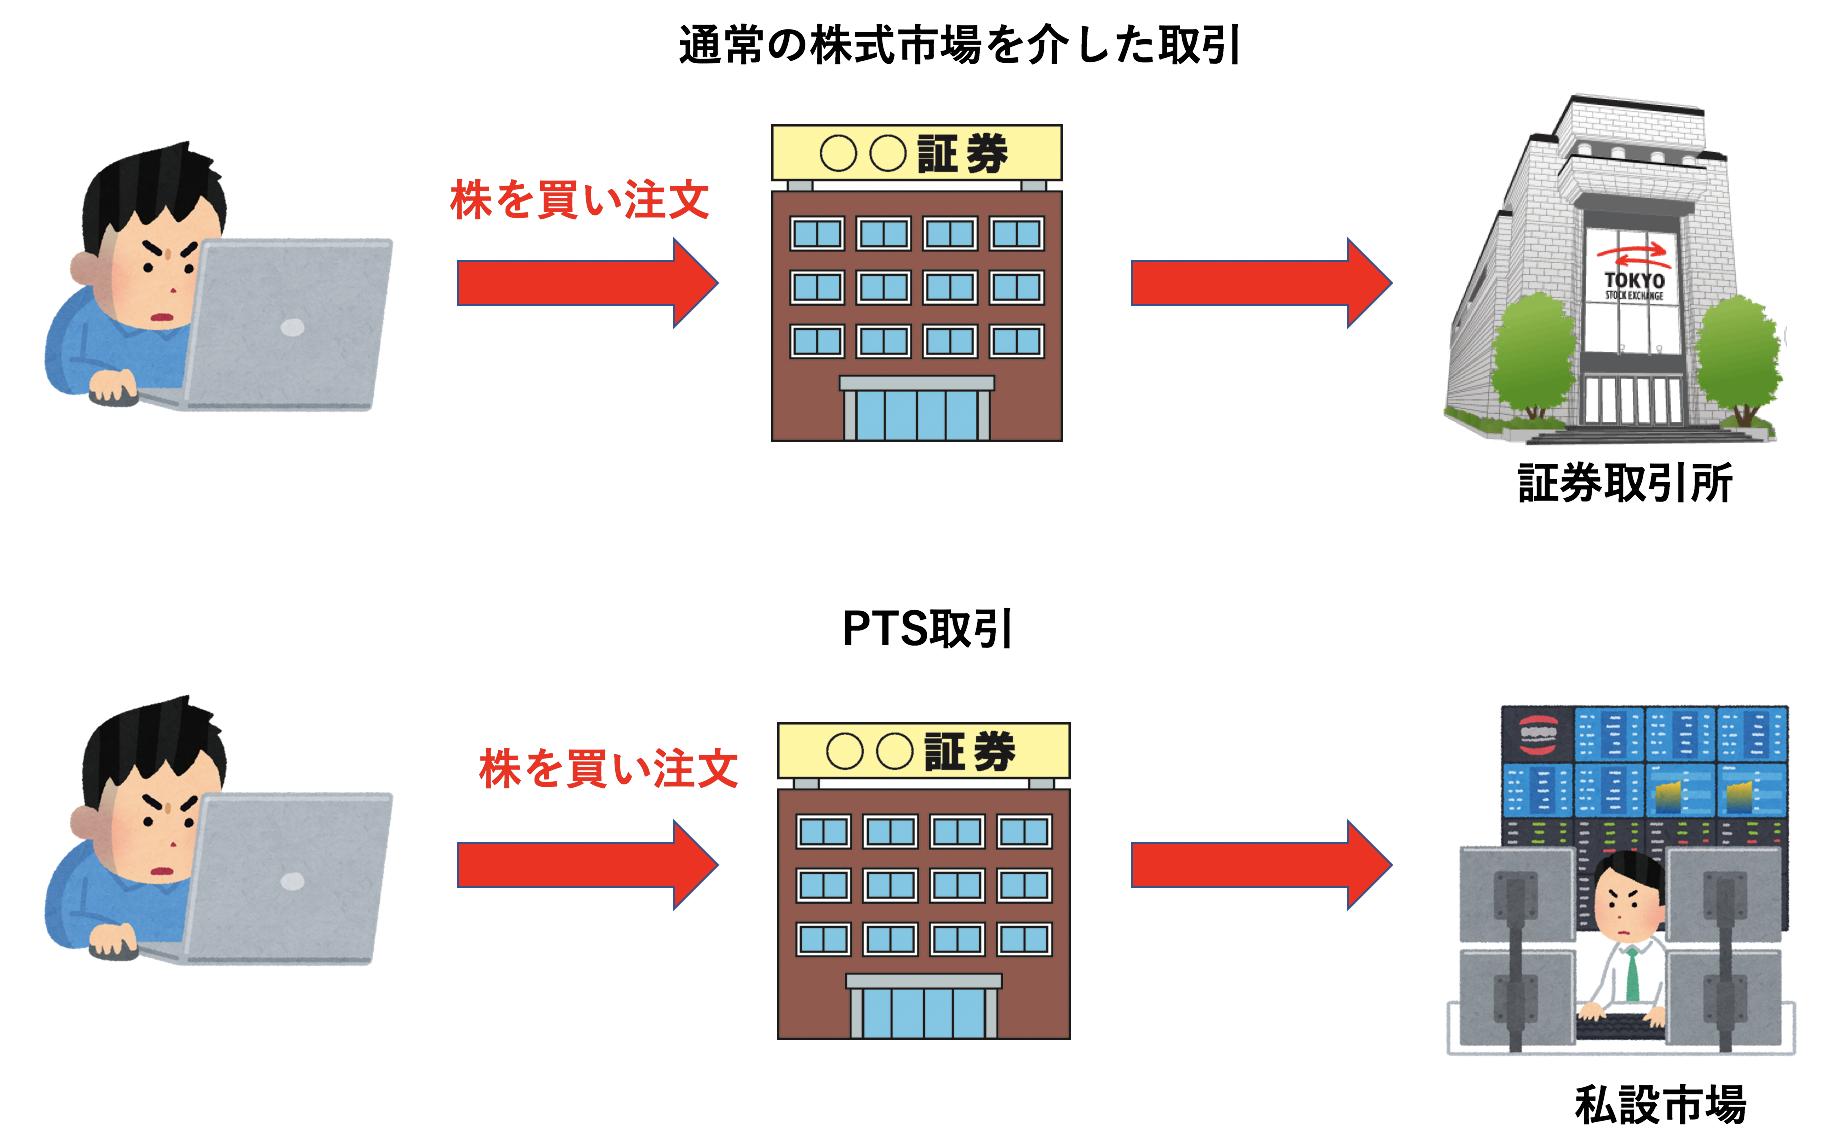 PTS取引と通常の株式取引の差をわかりやすく図解